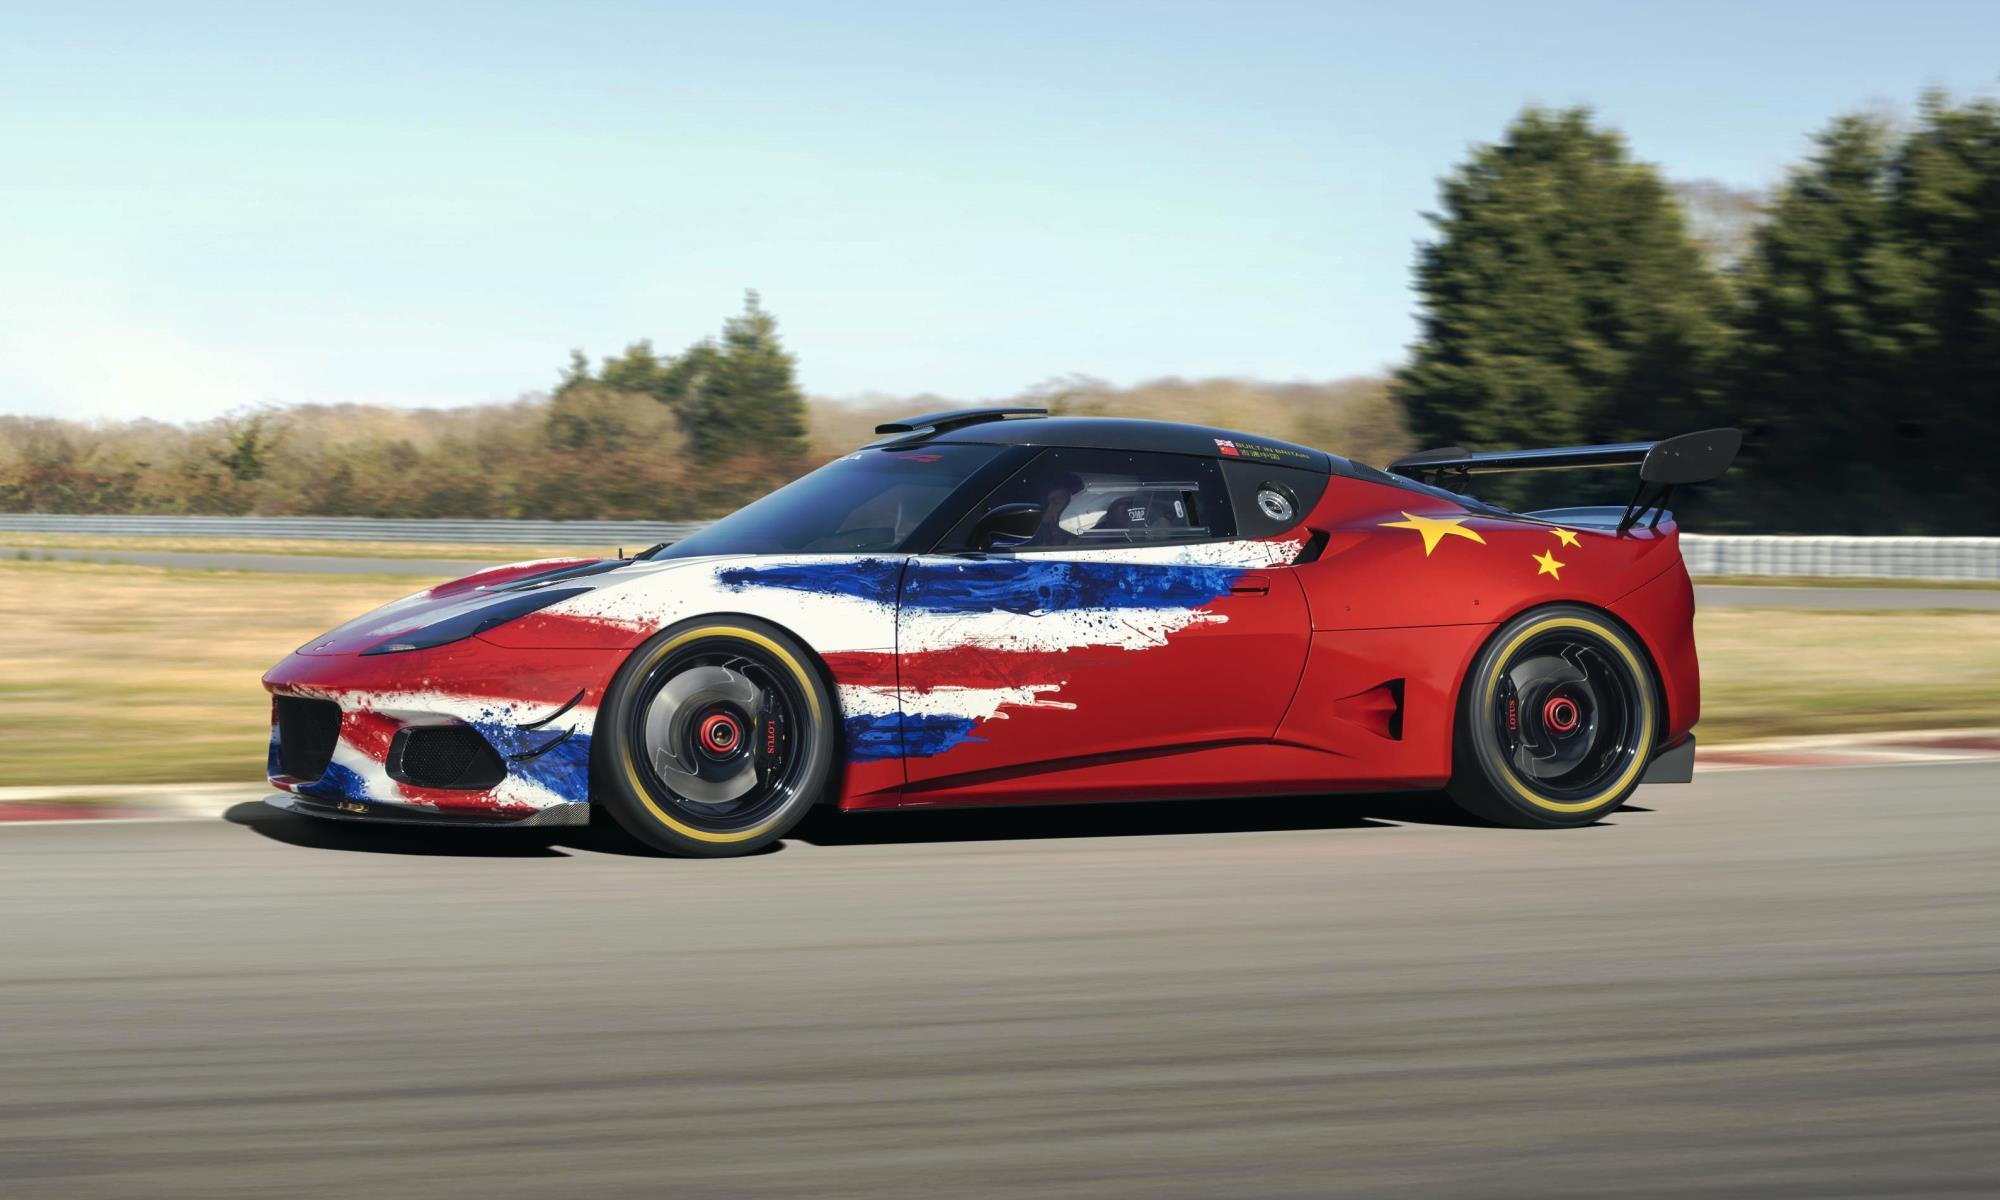 Lotus Evora GT4 Concept Racecar side